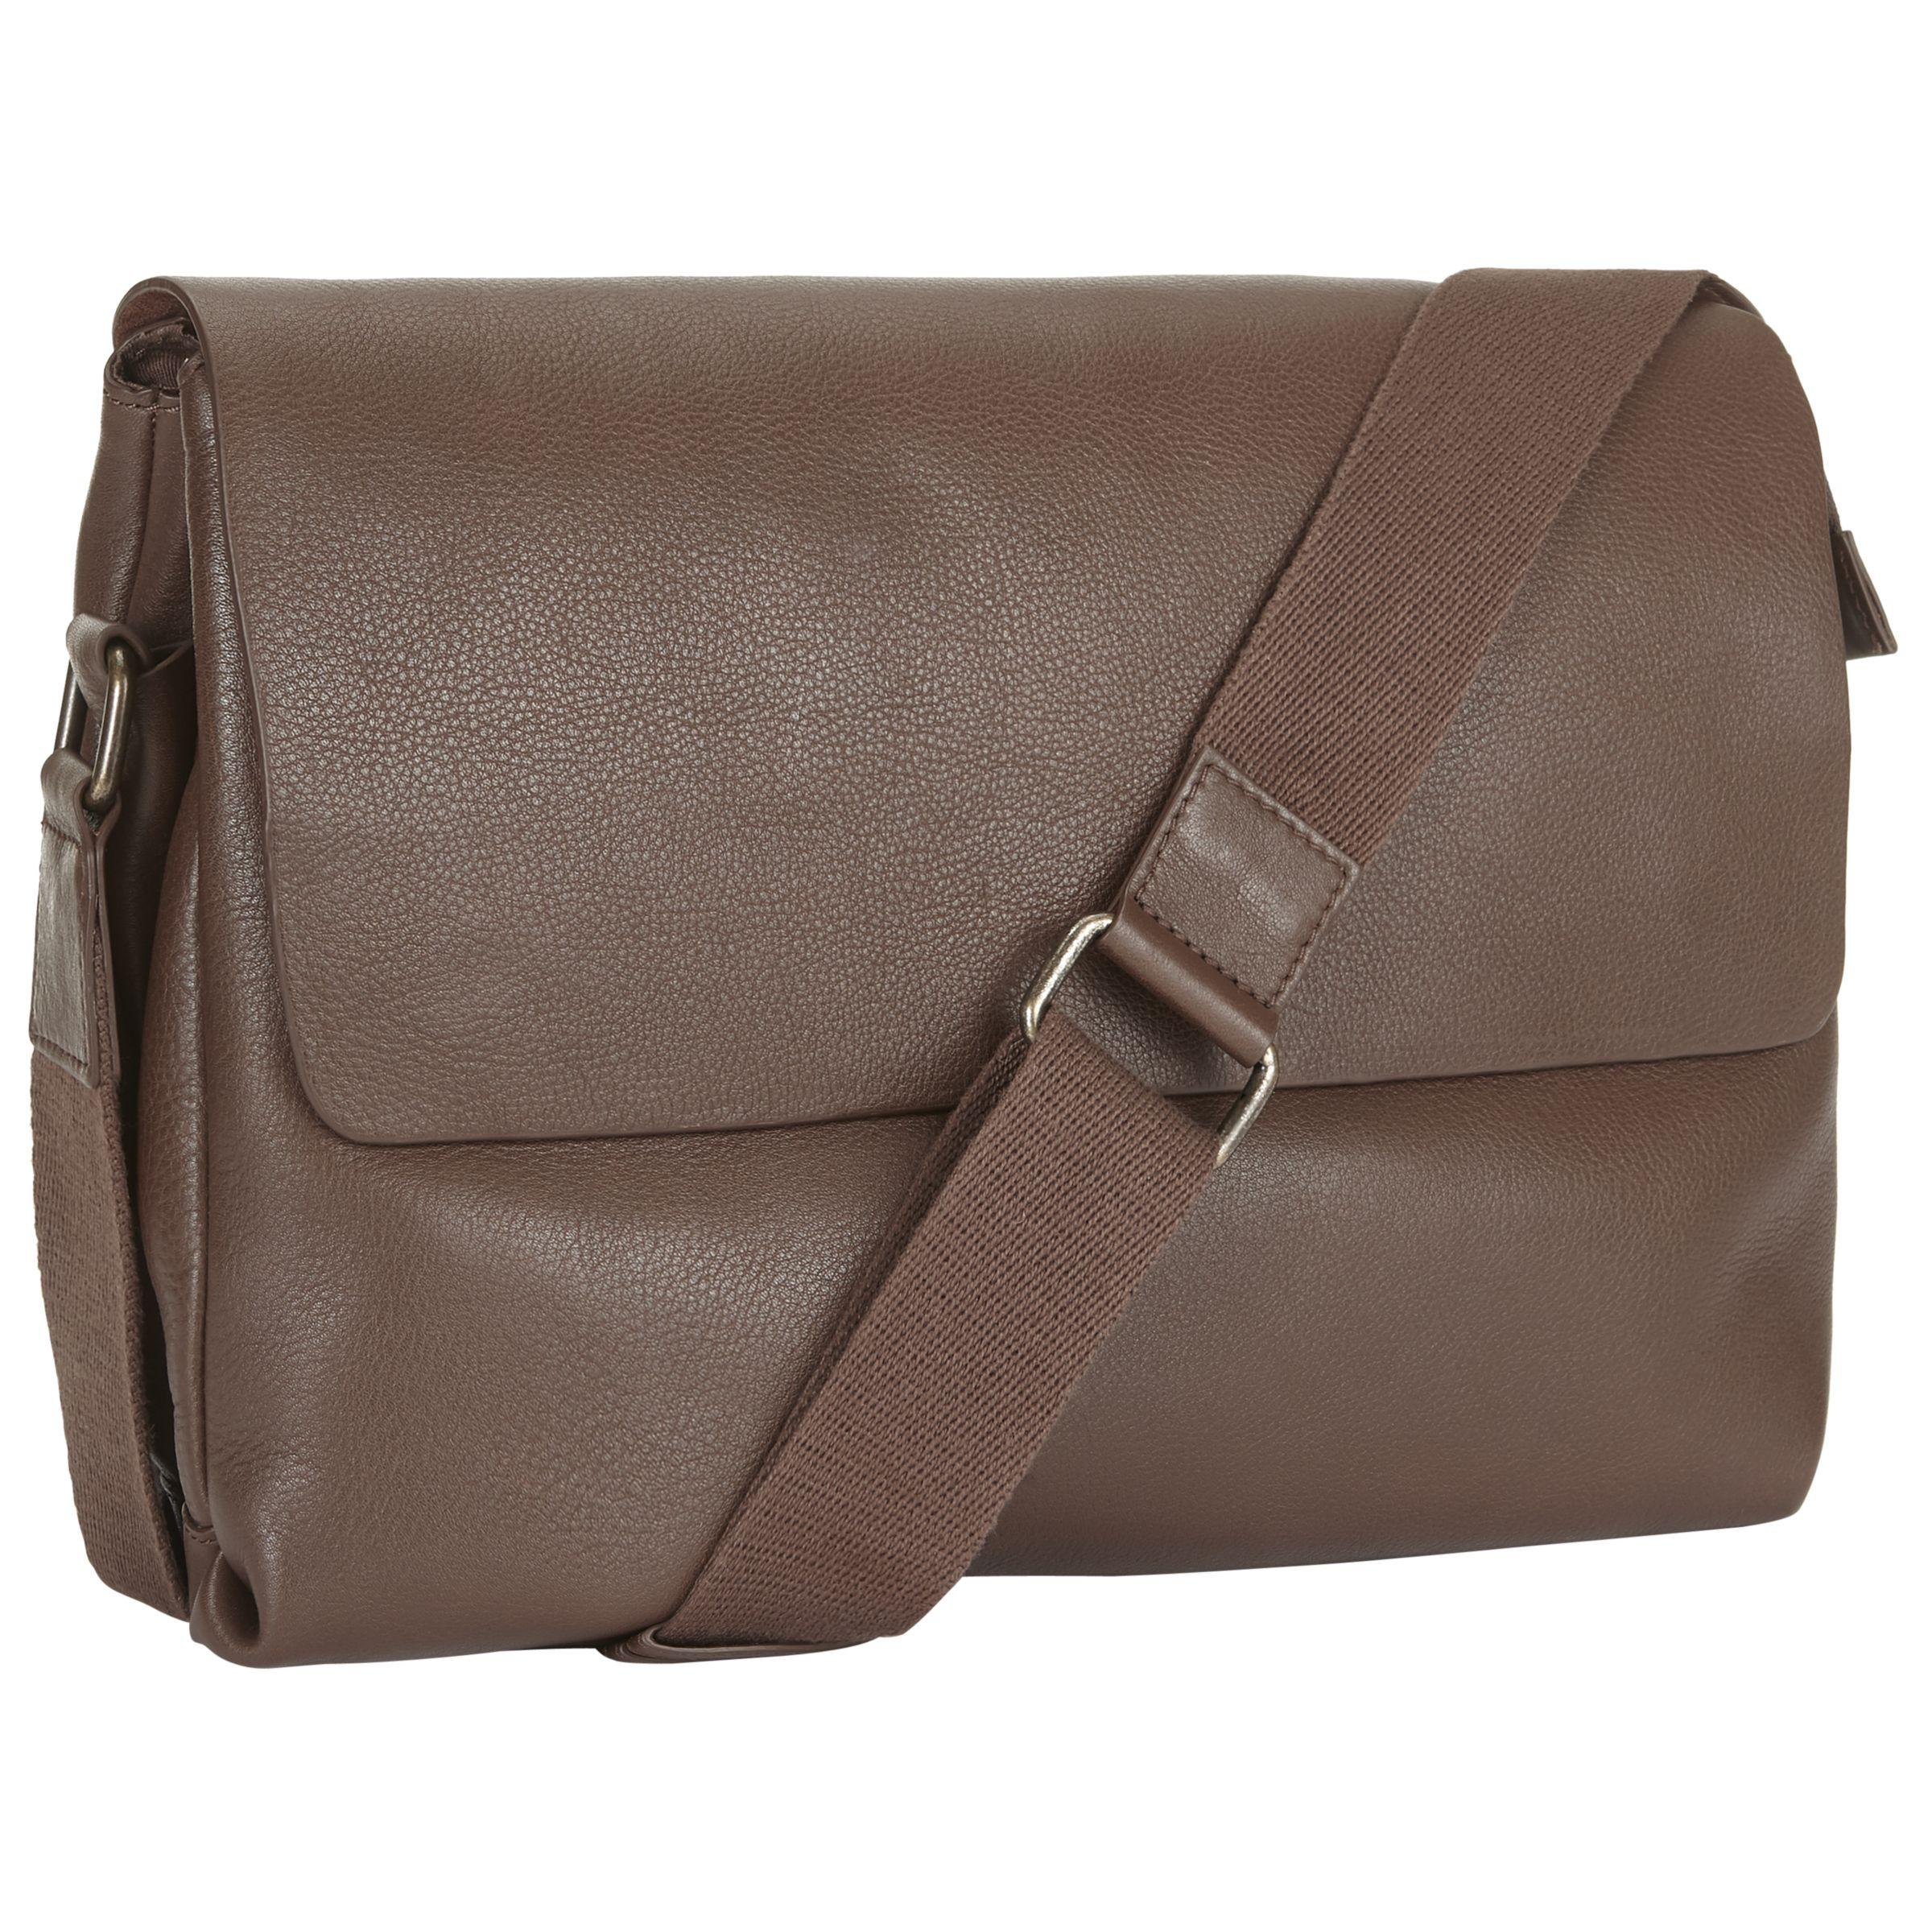 John Lewis Brown Boston Leather Messenger For Men Lyst View Fullscreen